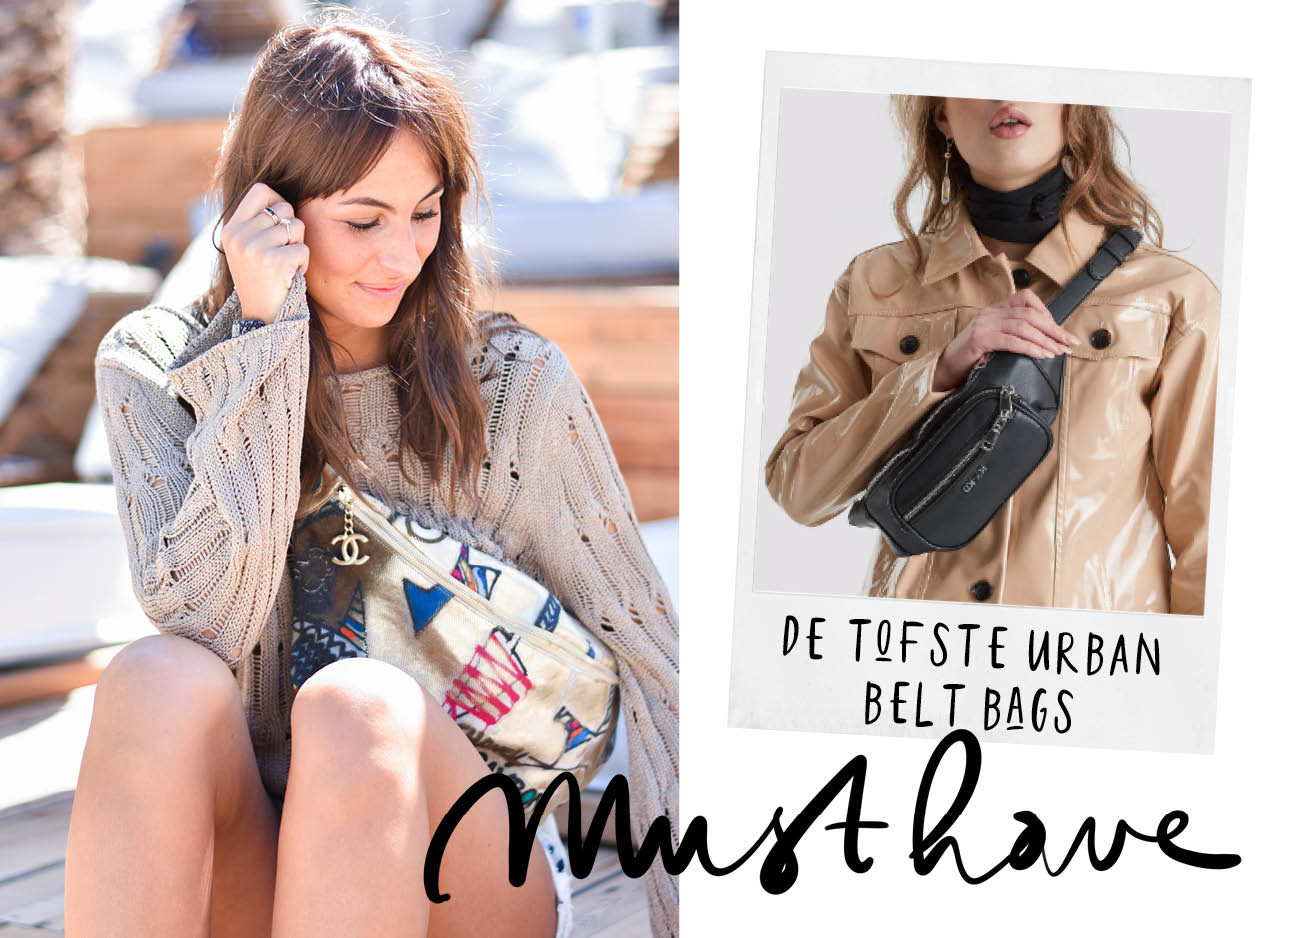 Lilian Brijl met Chanel urban belt bag